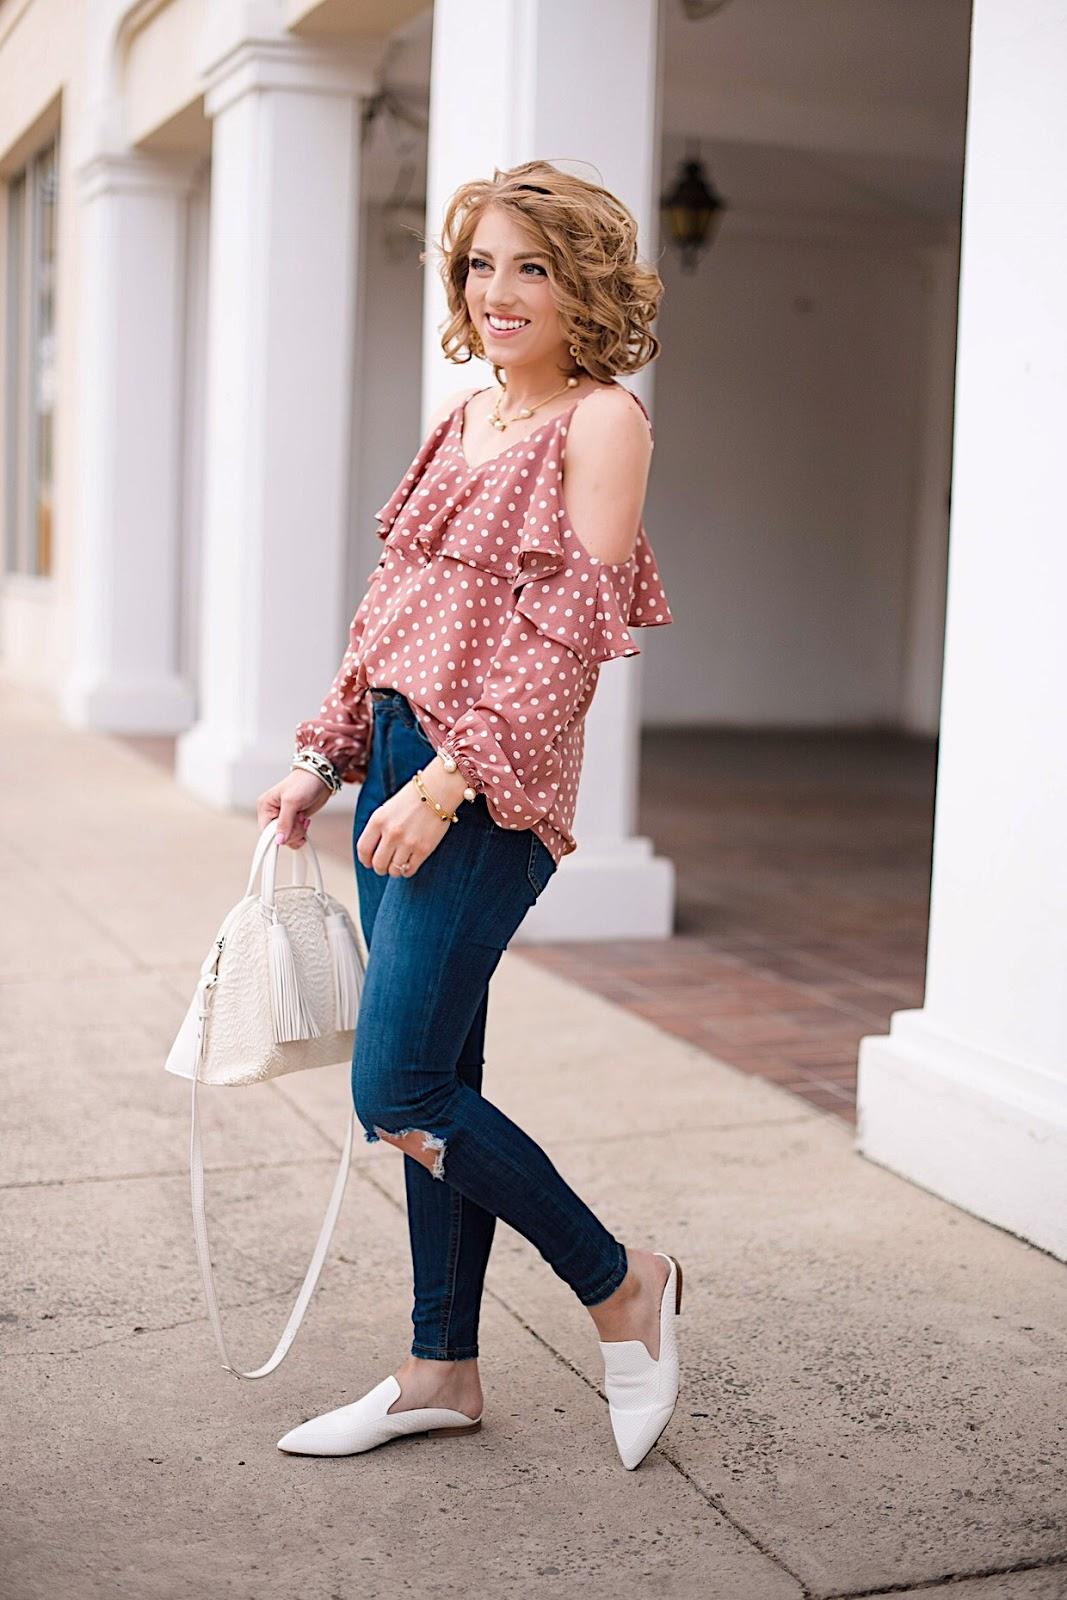 Kristin Cavallari Capri Mules - Click through to see more on Something Delightful Blog